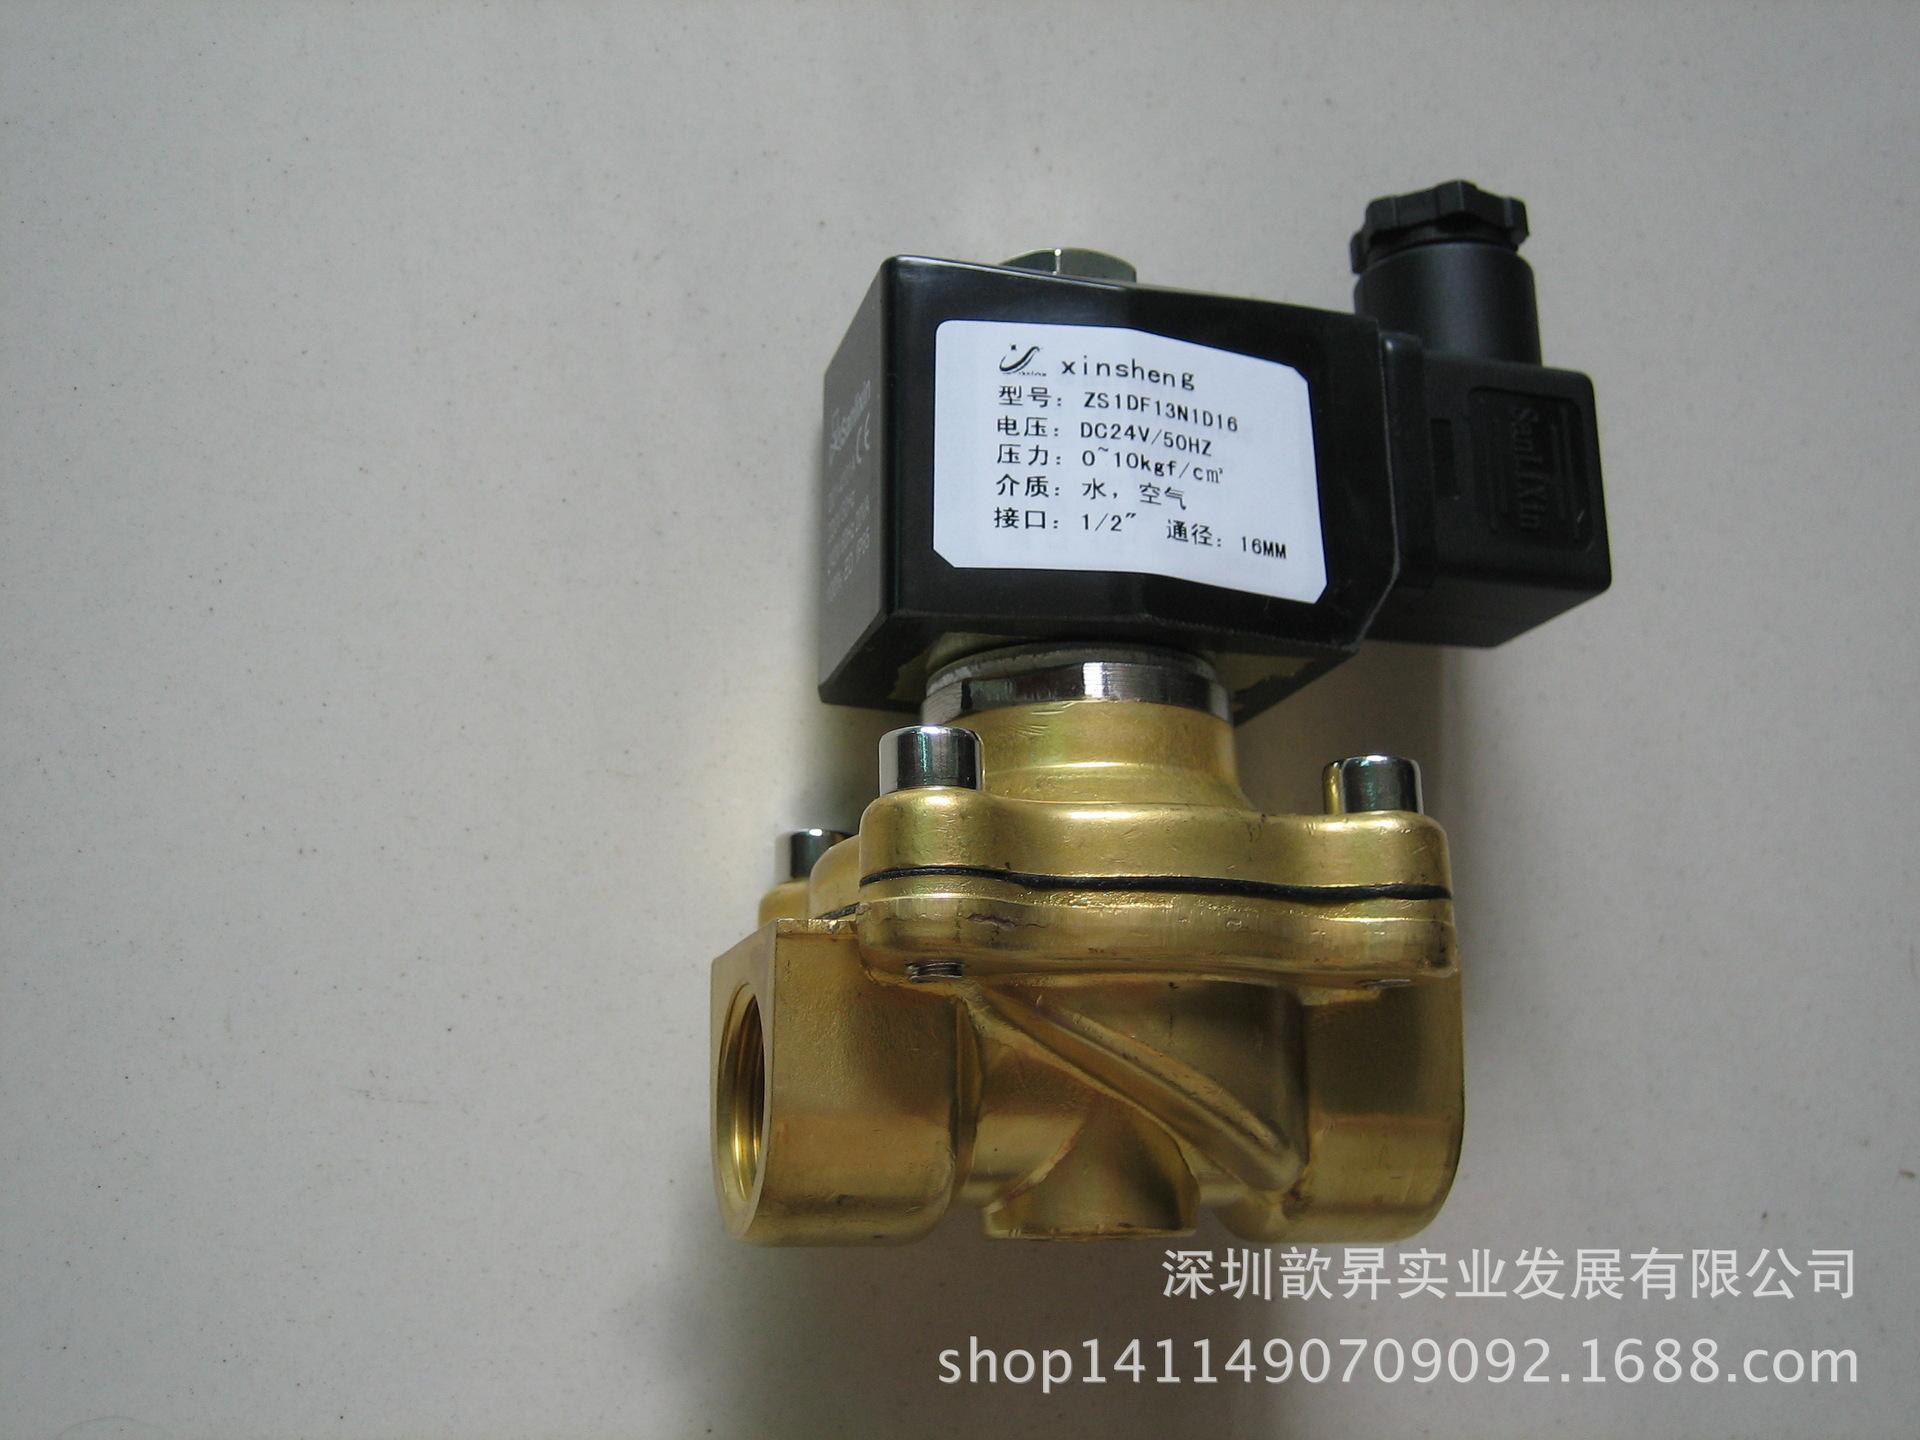 ZS系列ZS1DF13N1K50 2寸 阿里巴巴